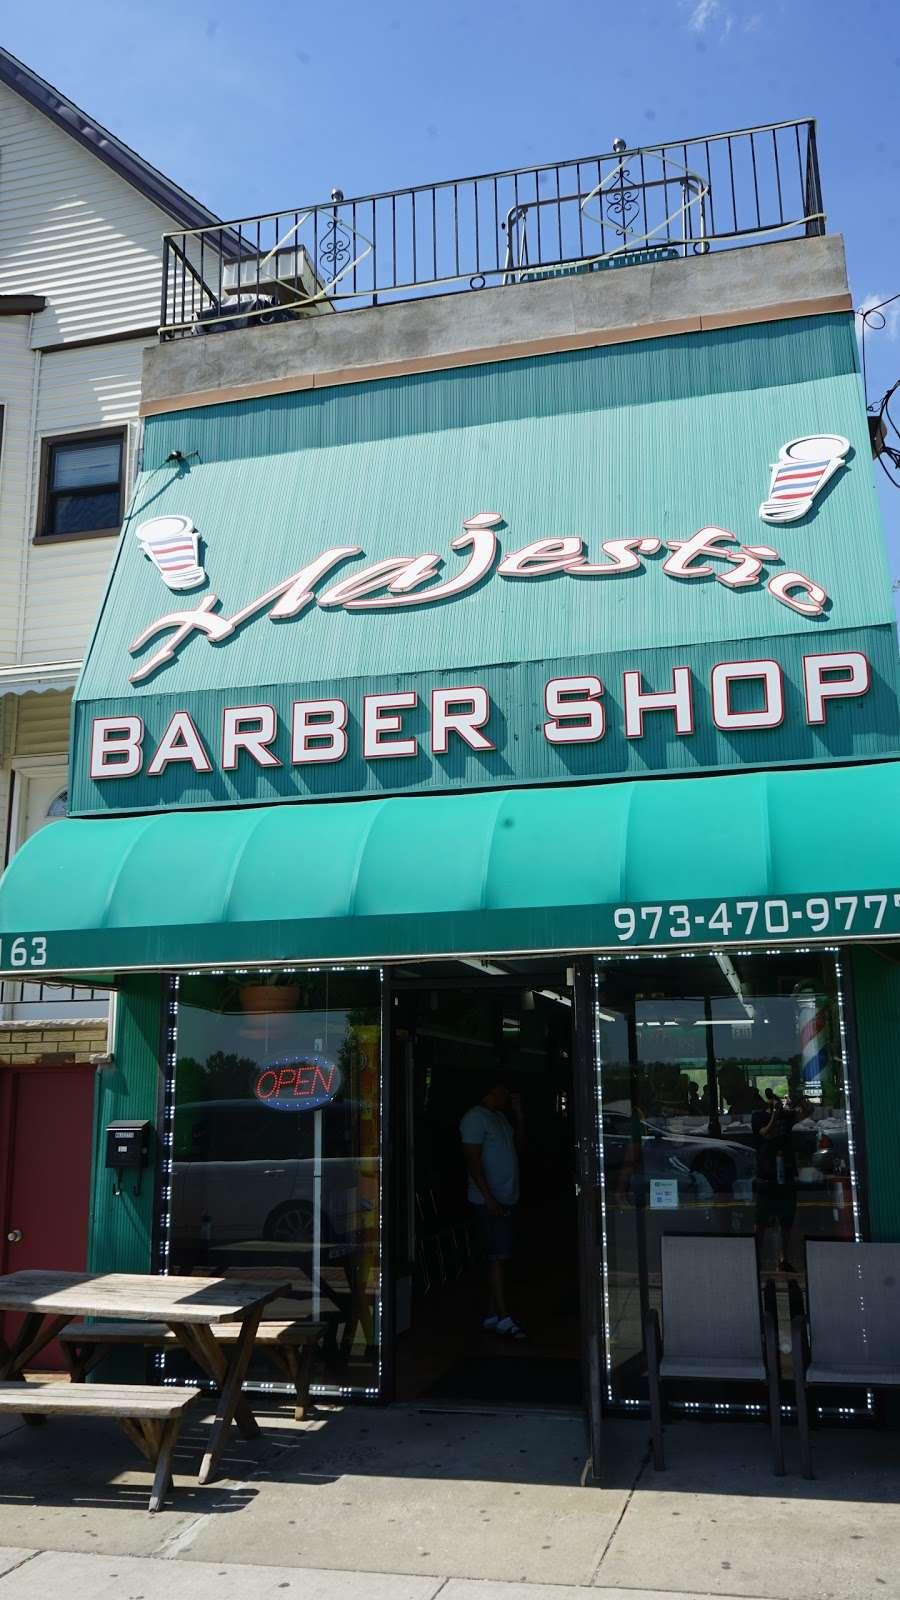 Majestic barbershop - hair care  | Photo 2 of 10 | Address: 163 Passaic St, Garfield, NJ 07026, USA | Phone: (973) 470-9777